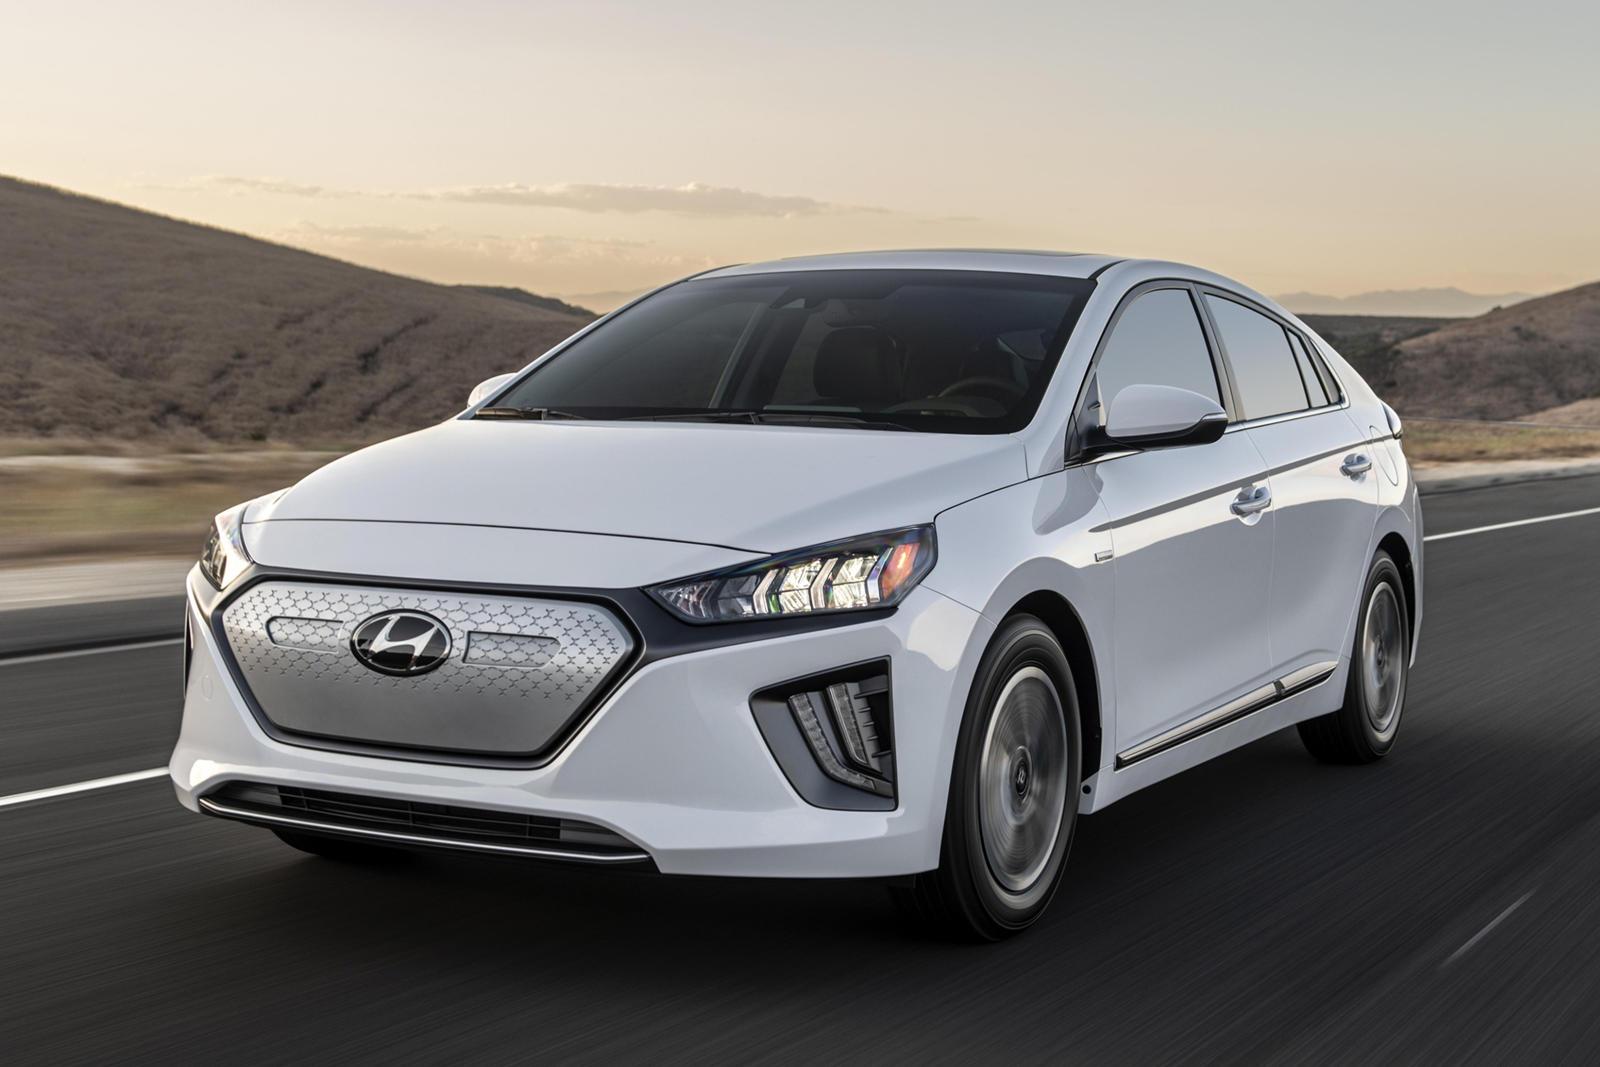 82949 2020 Hyundai Ioniq Arrives With Fresh Styling And Improved Range